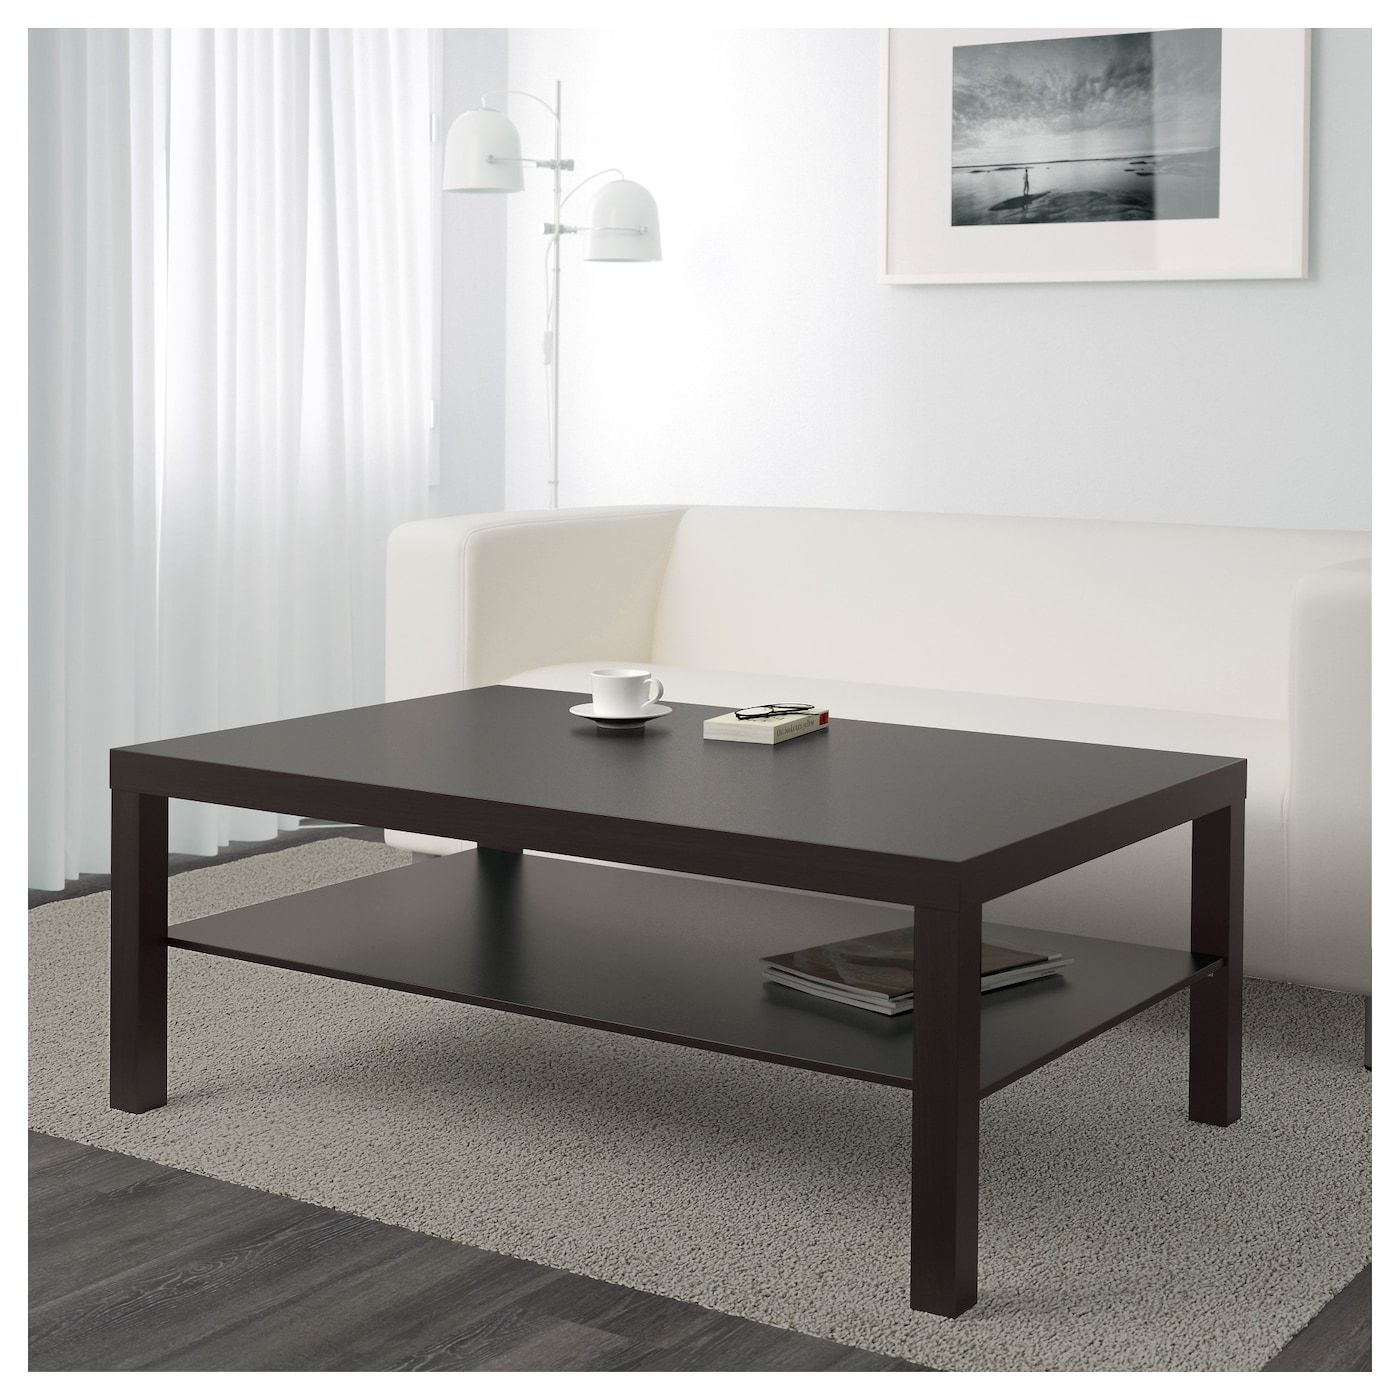 "LACK Coffee table blackbrown 46 1/2x30 3/4 "" (118x78 cm"